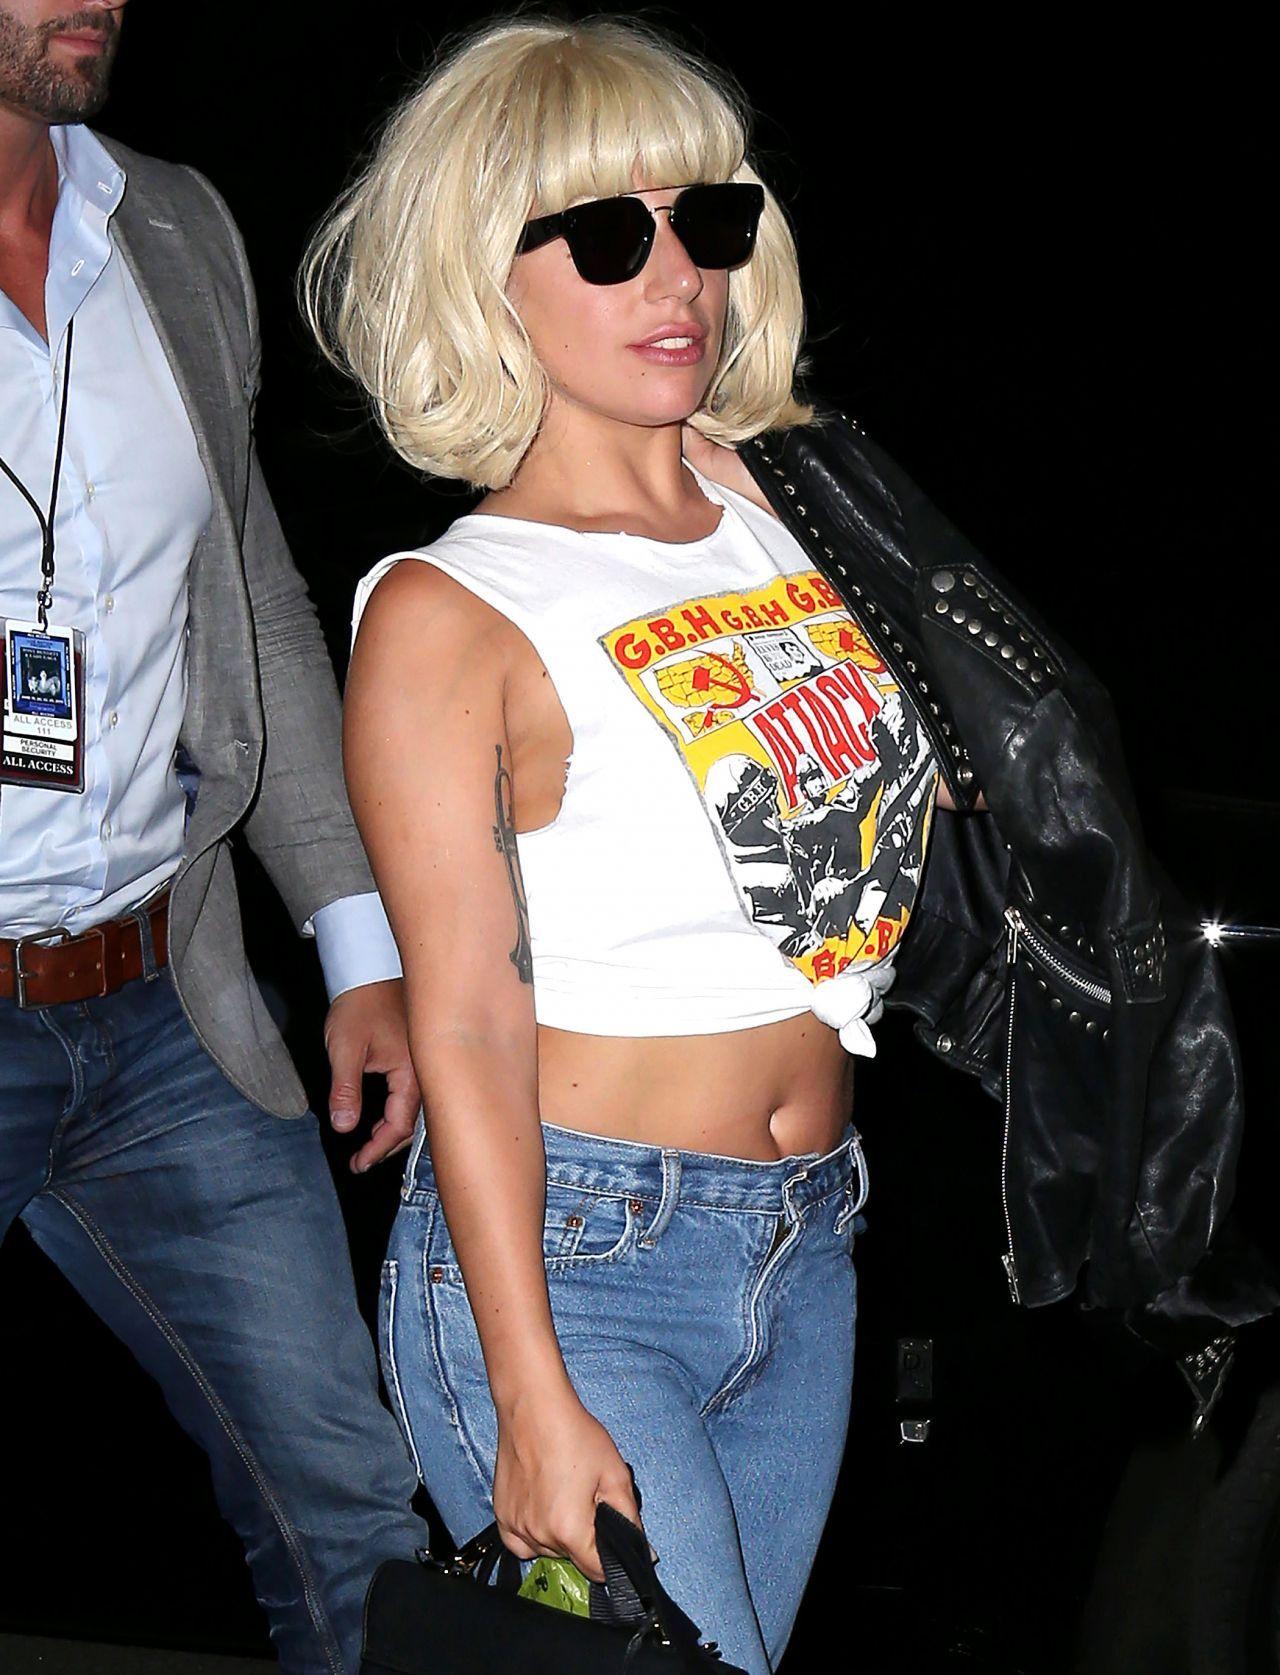 Google themes lady gaga - Lady Gaga Street Style Google Search